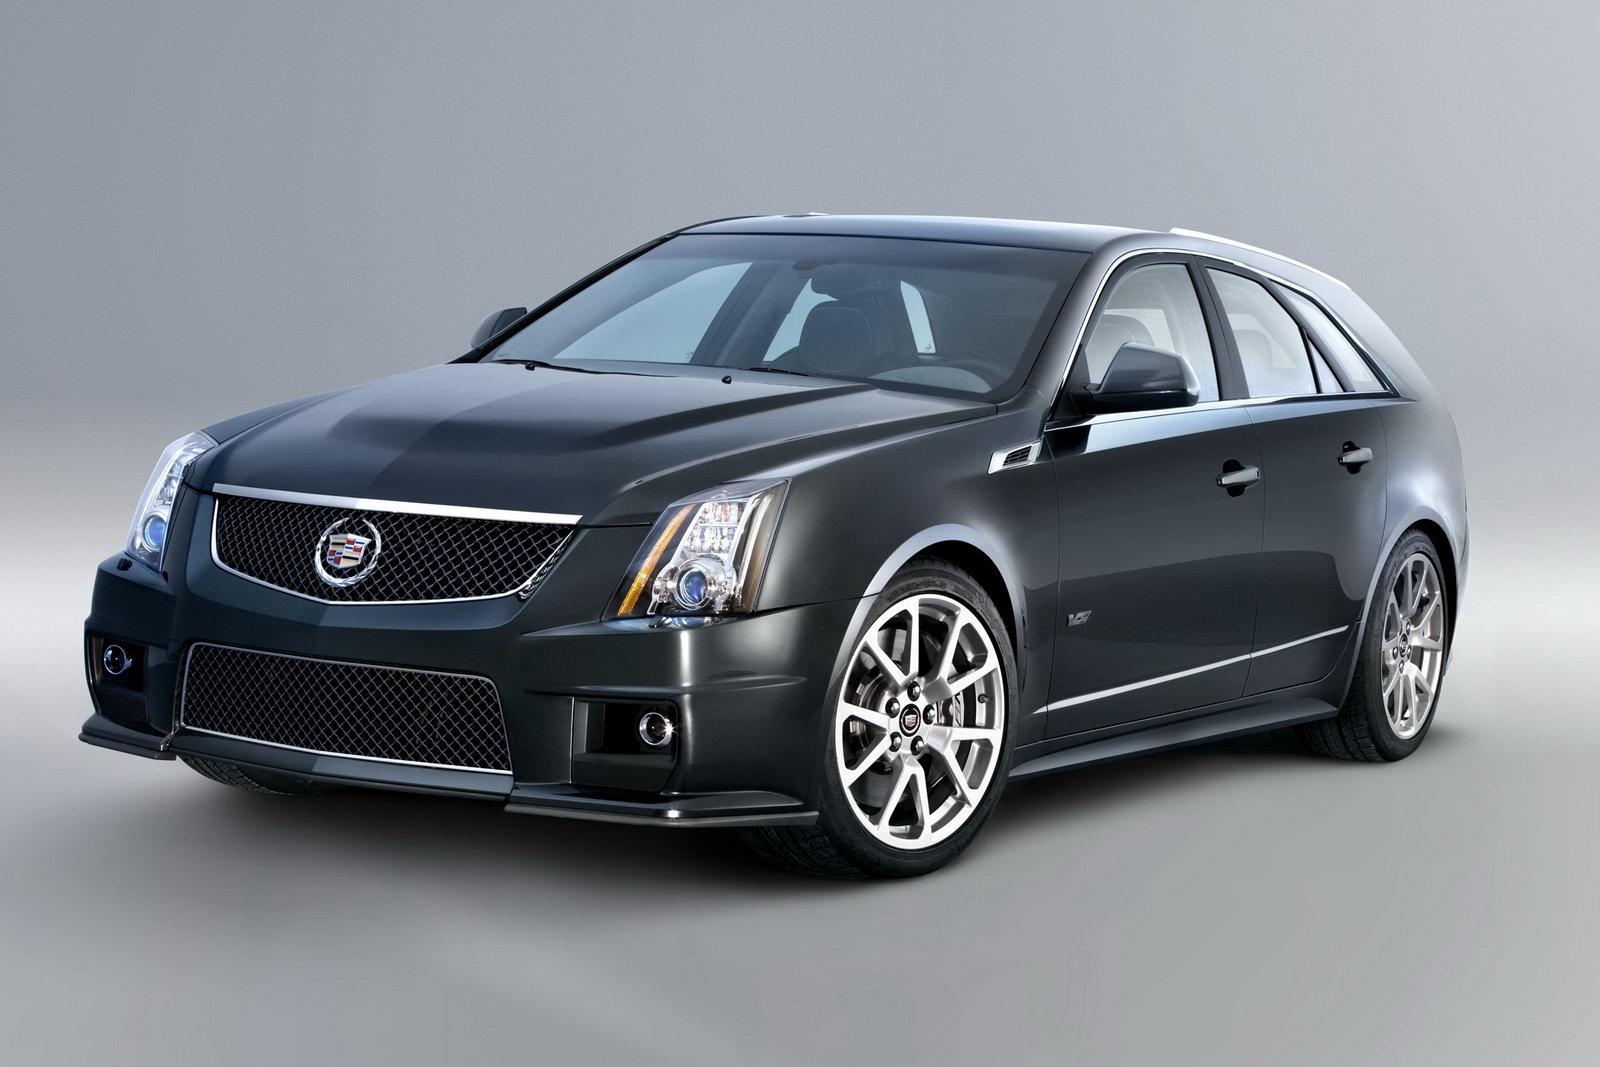 car going under 07 2011 cadillac cts v650 sport wagon. Black Bedroom Furniture Sets. Home Design Ideas